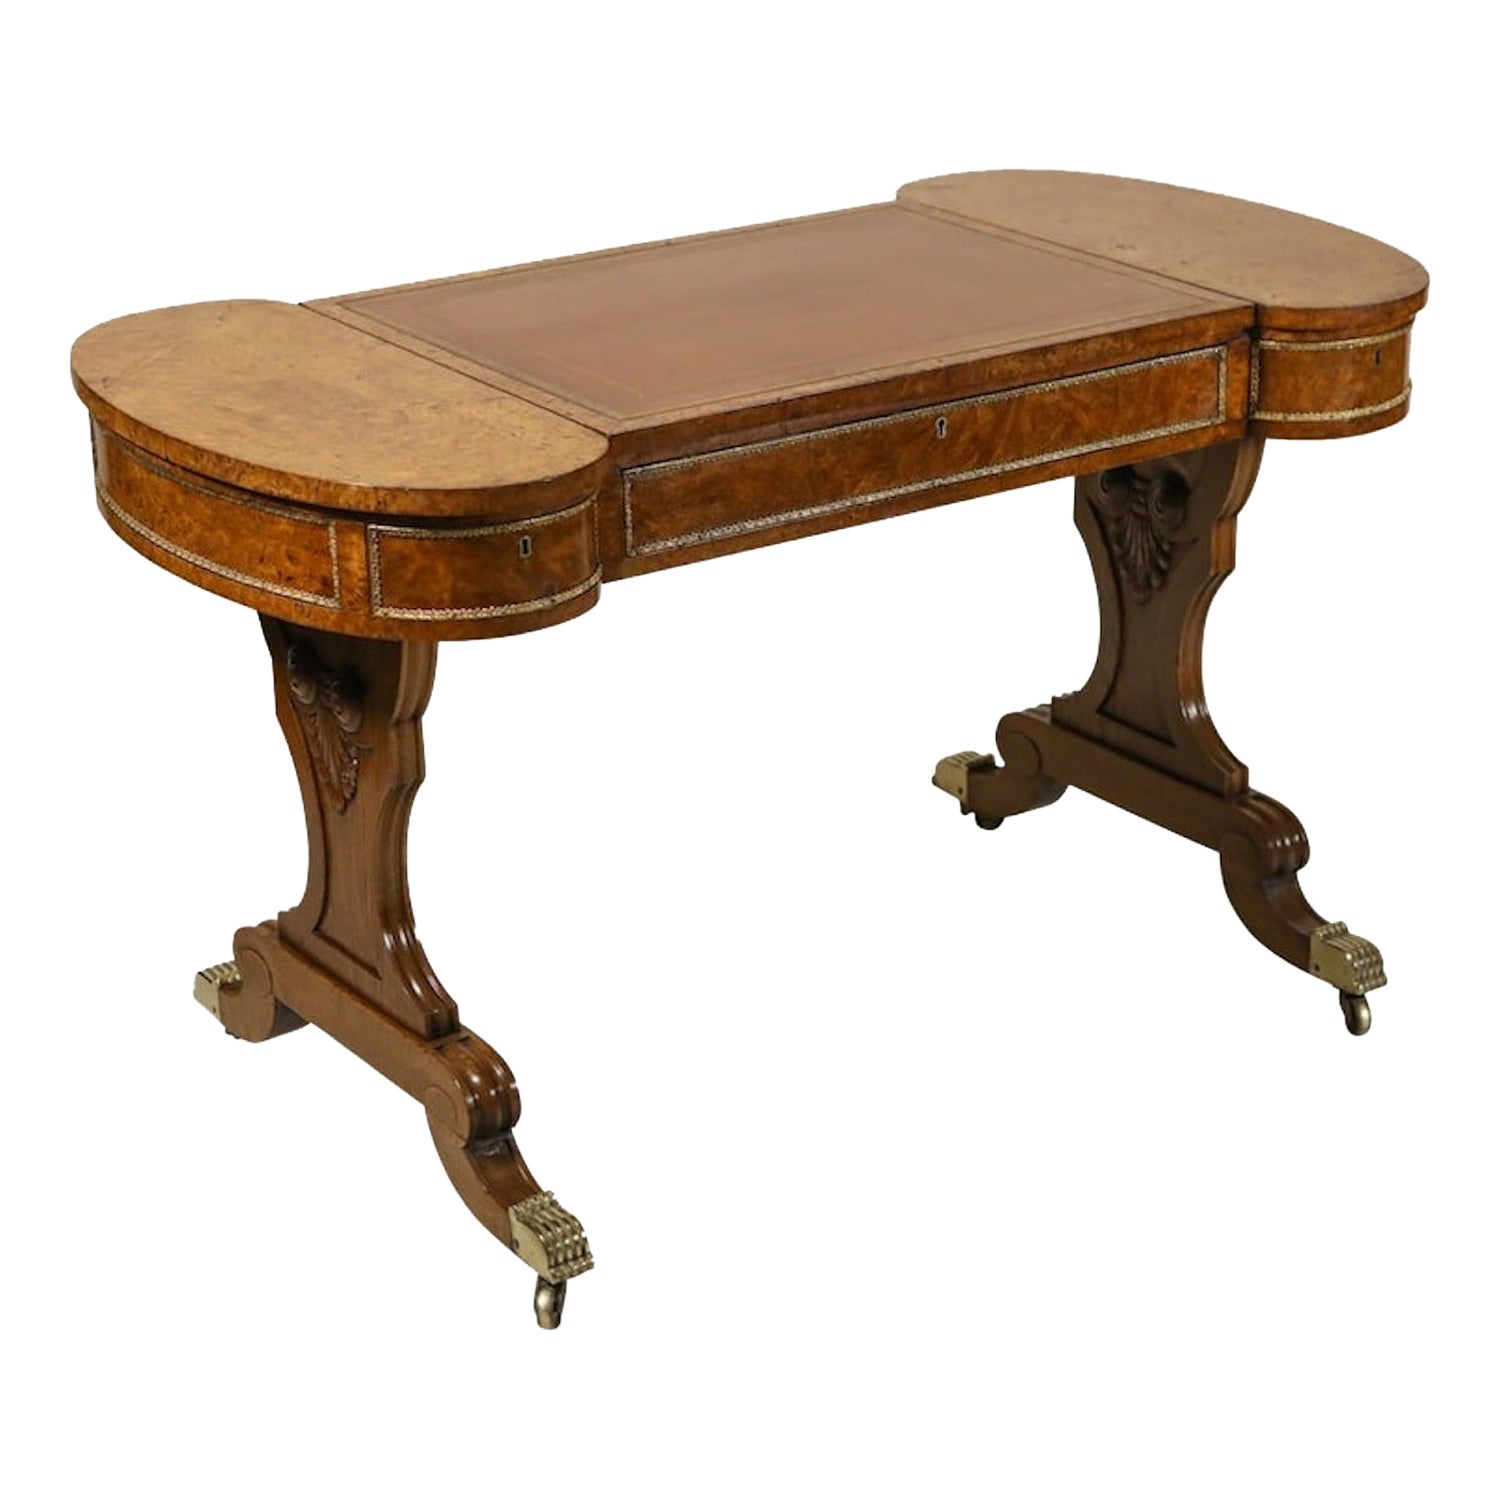 Early 19th Century Brass-Mounted Pollard Oak Writing Table